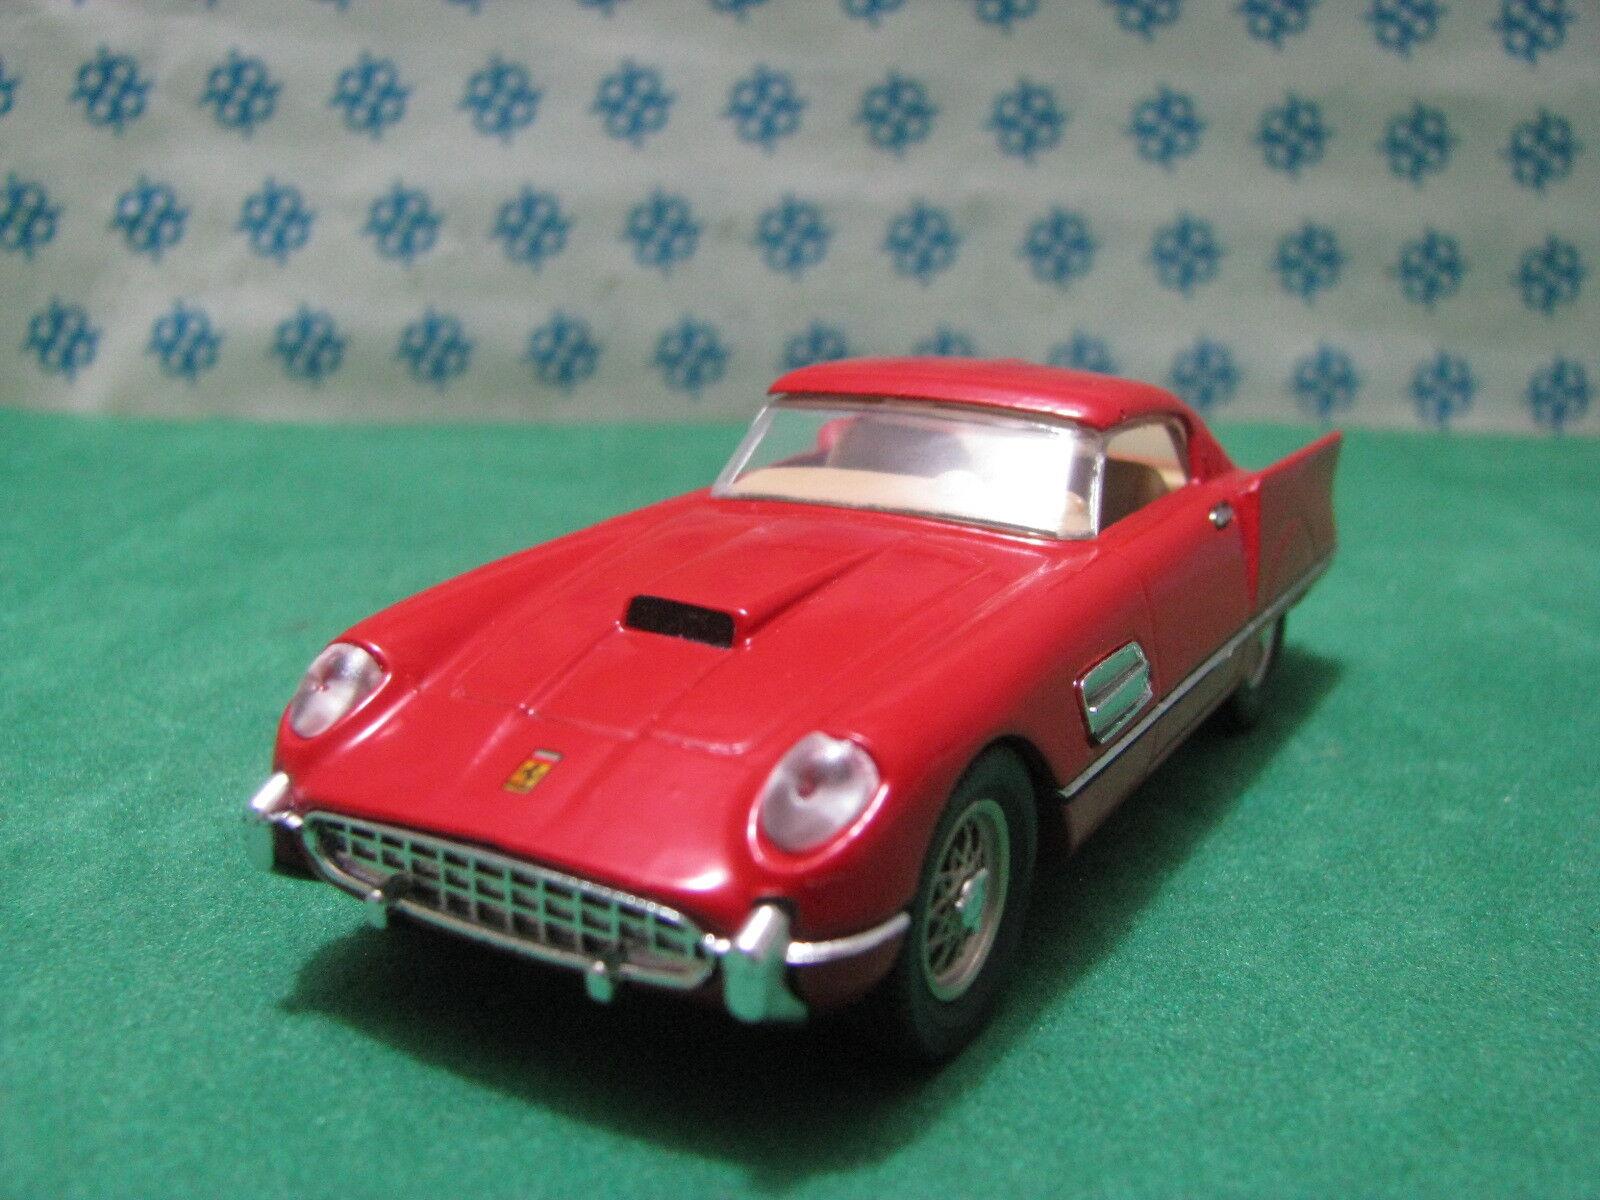 FERRARI 410 S.A. Superfast I Pininfarina 1956 Red - Idea 3